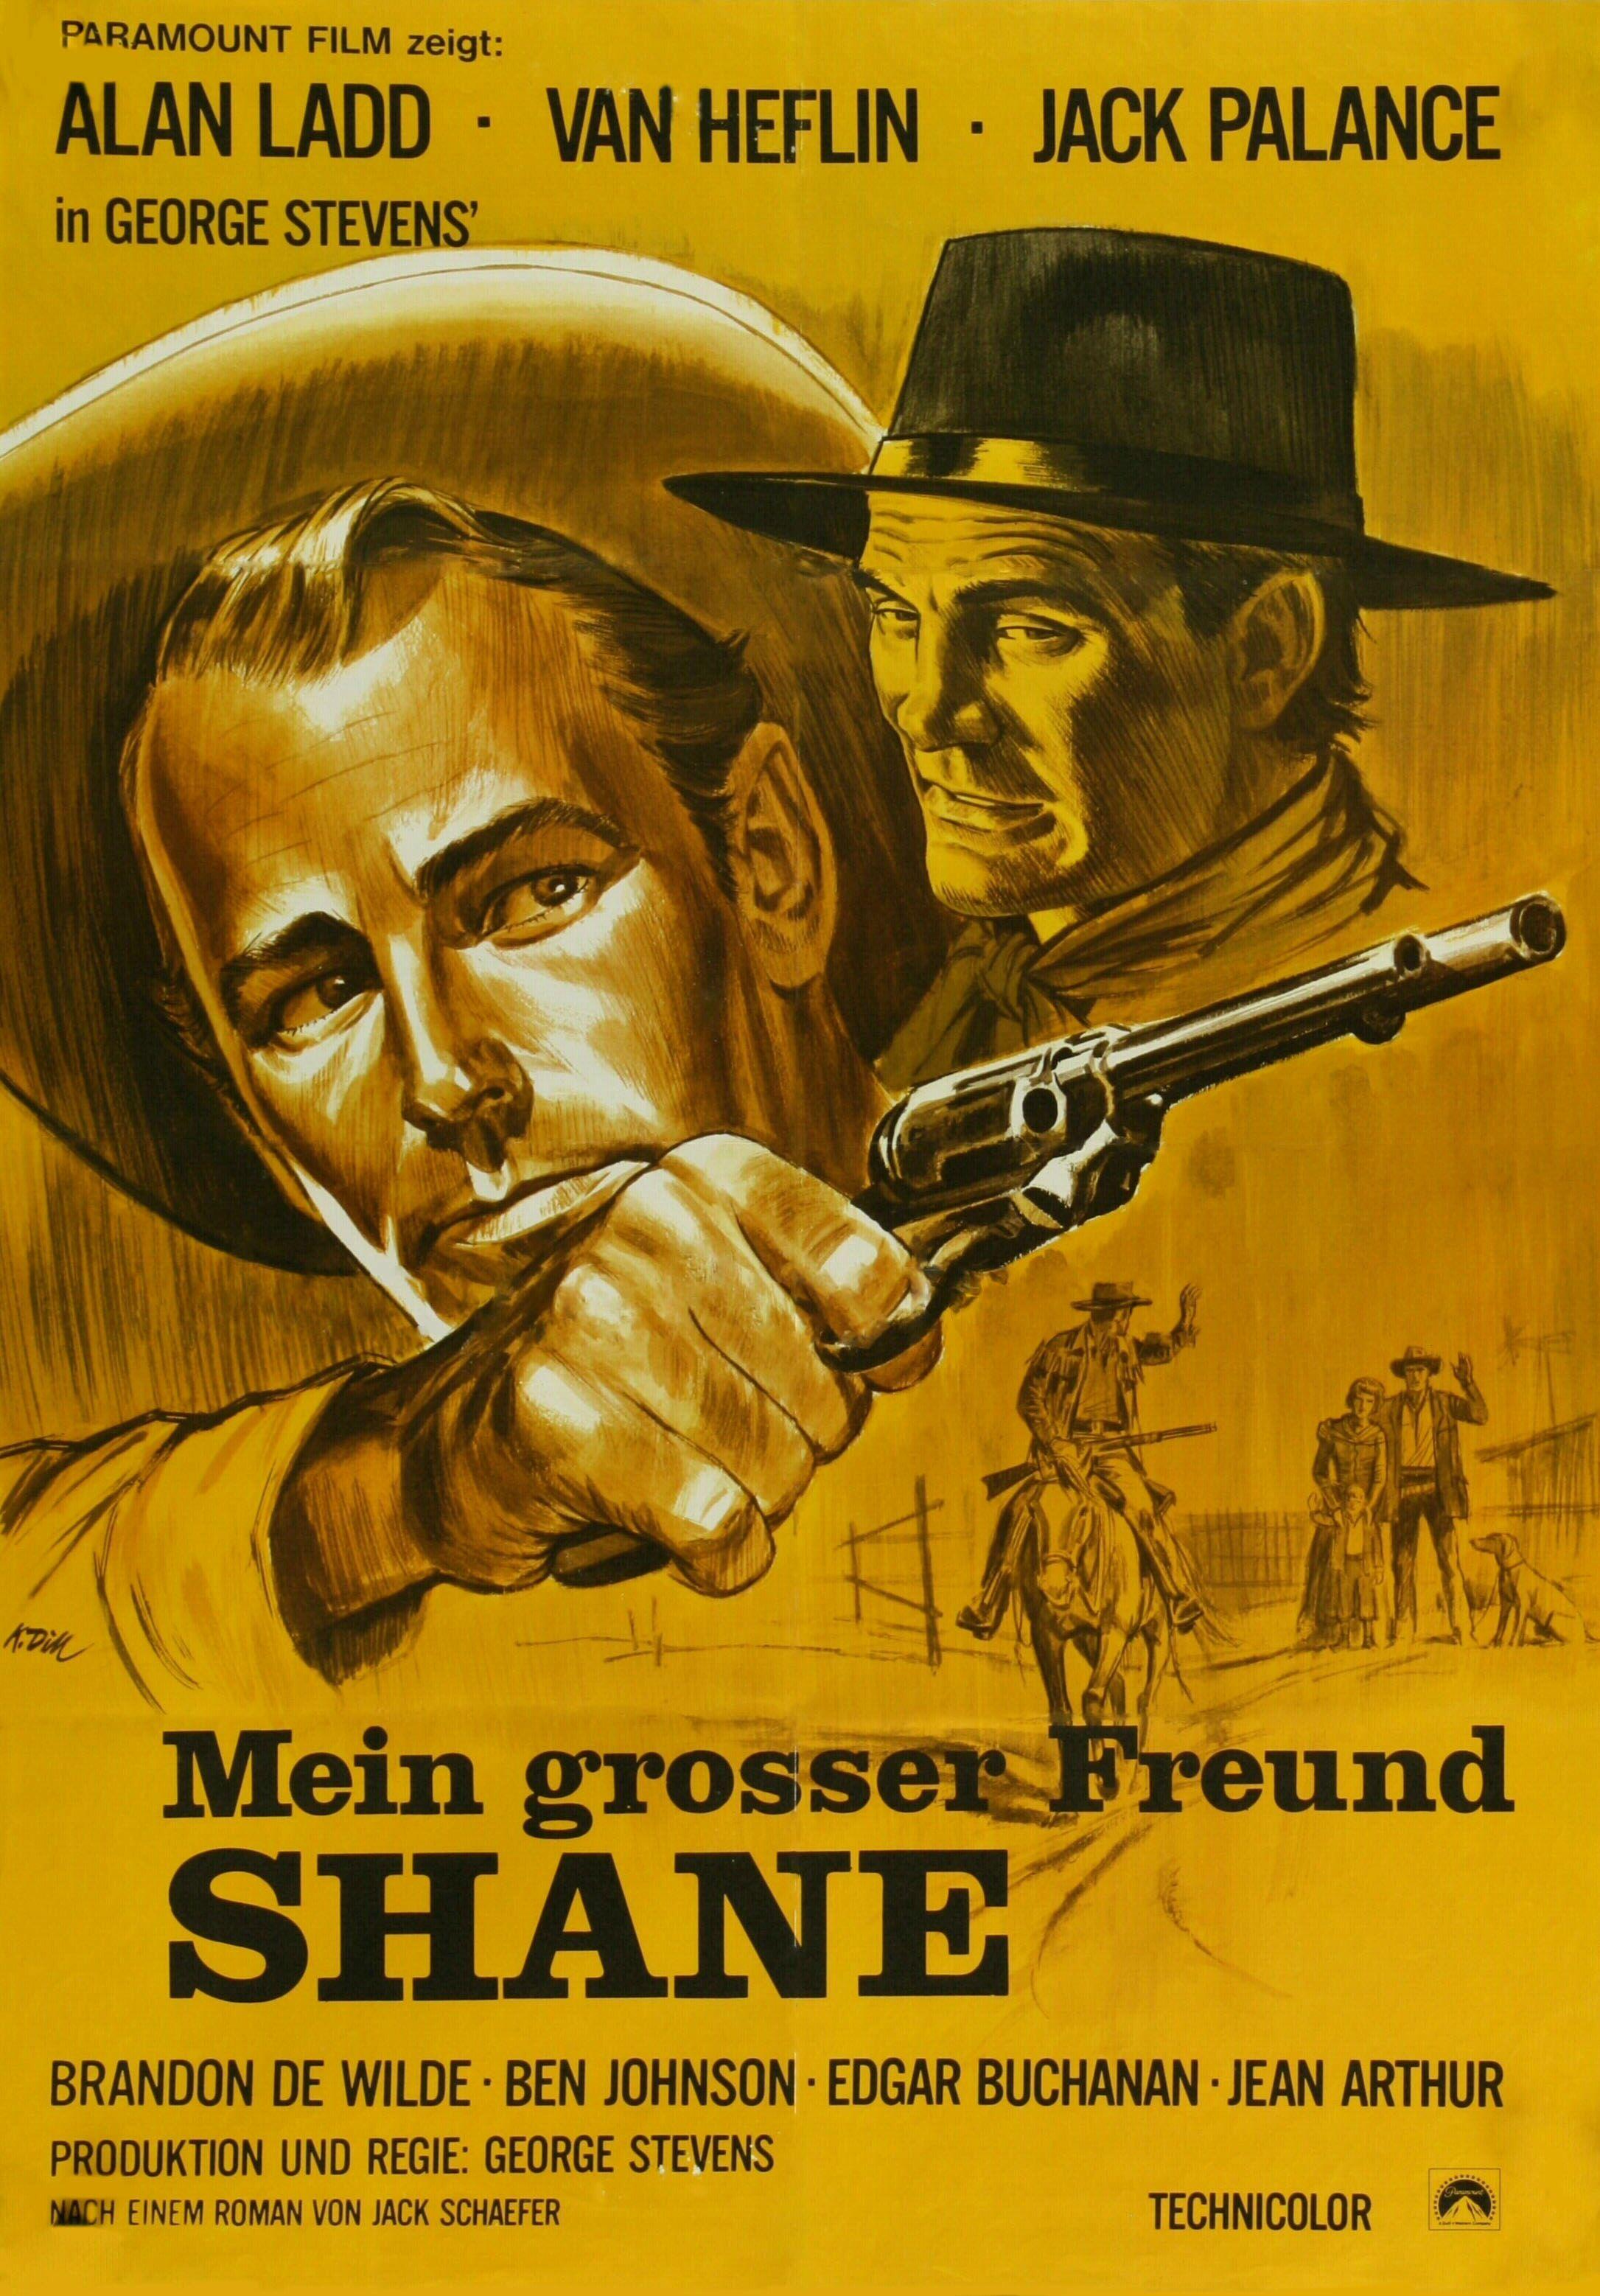 Alan Ladd 1913 1964 Western Movies Saloon Forum Vieux Films Films Retro Affiche Cinema